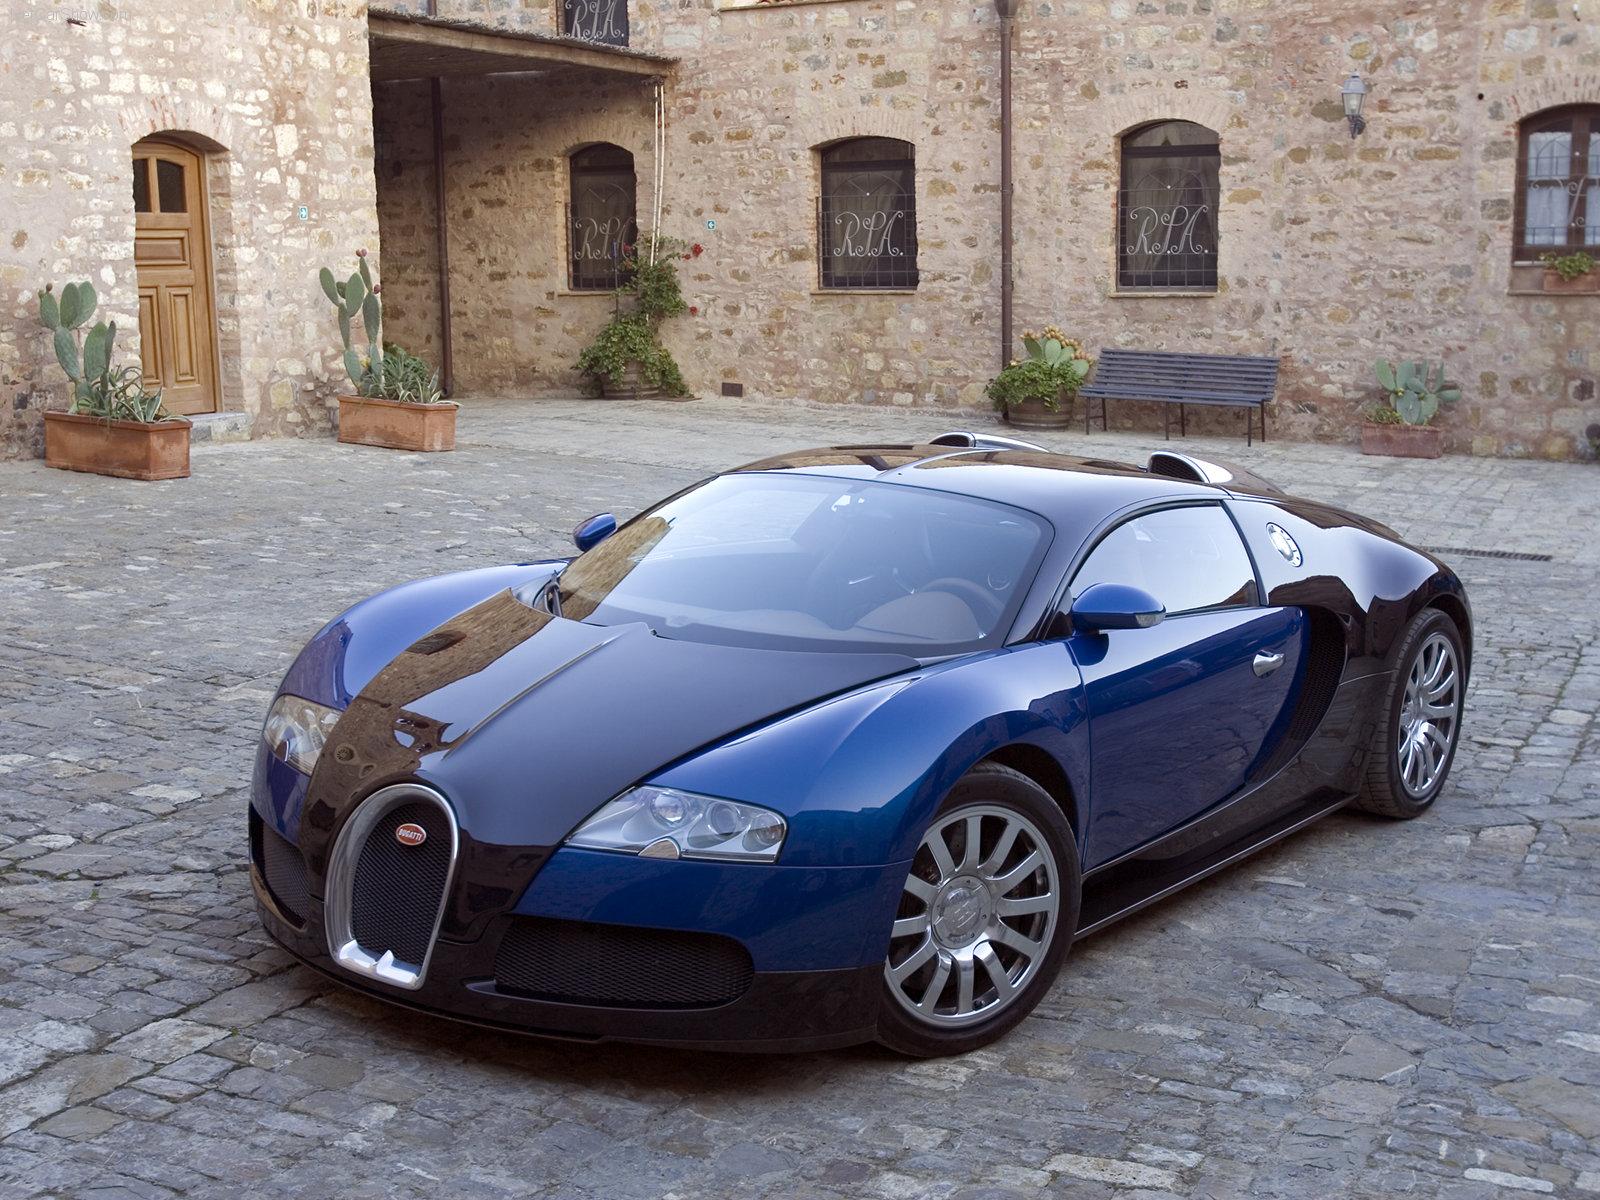 bugatti eb 16.4 veyron photos - photogallery with 78 pics | carsbase